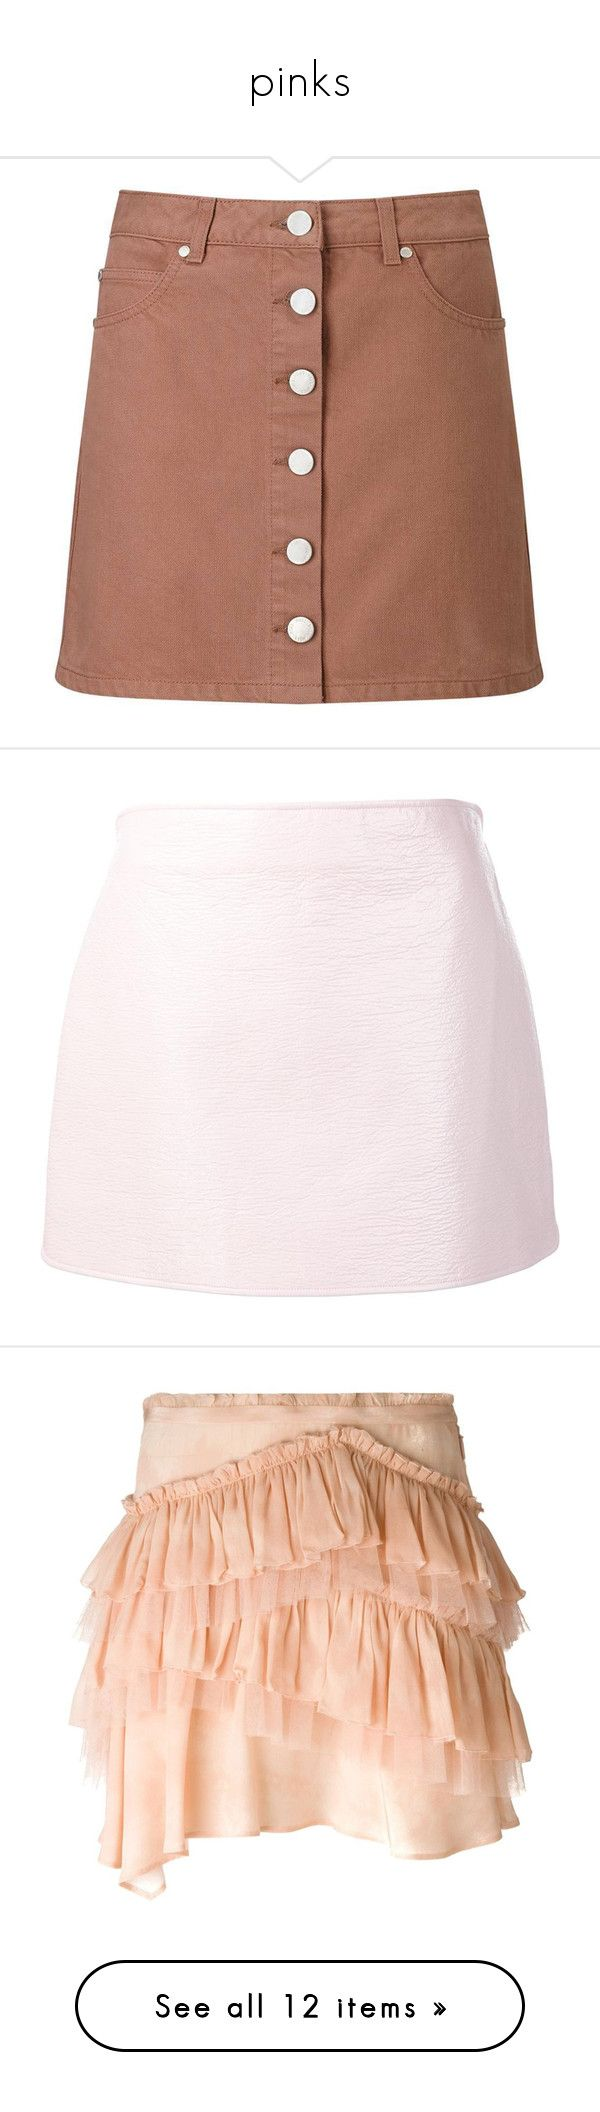 """pinks"" by jeniferkcarsrud ❤ liked on Polyvore featuring skirts, mini skirts, bottoms, pink, miss selfridge skirts, pink mini skirt, pink skirt, short pink skirt, short skirts and light pink mini skirt"